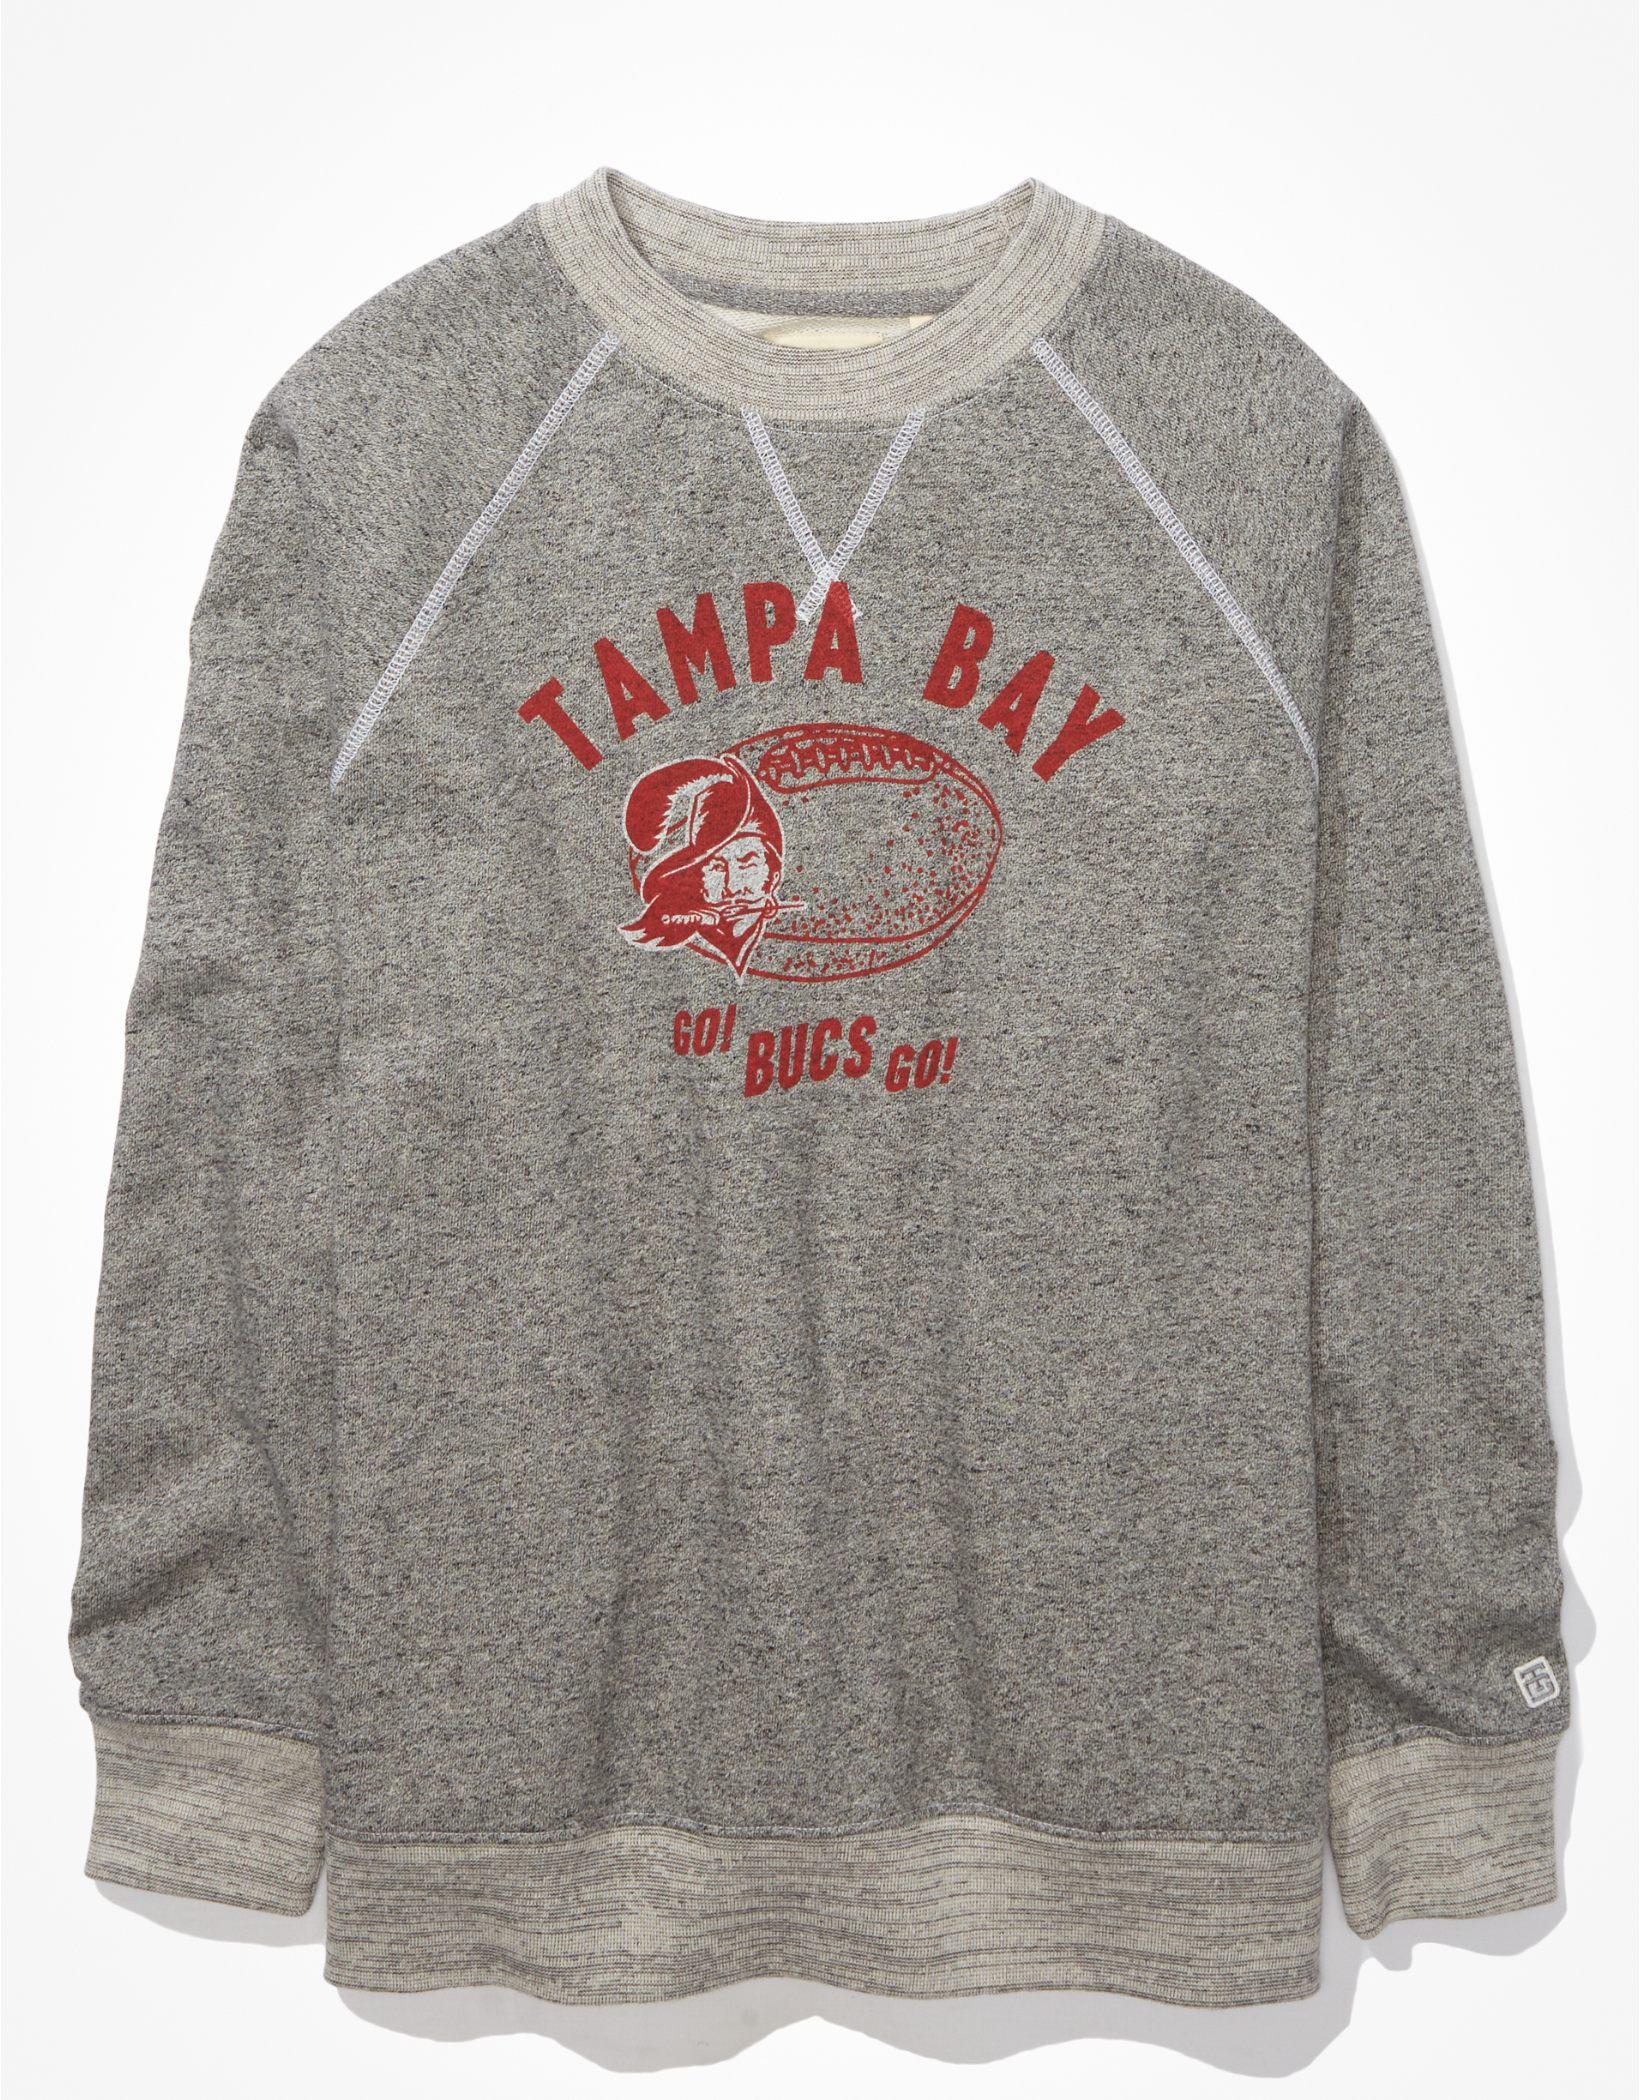 Tailgate Women's TB Buccaneers Oversized Fleece Sweatshirt